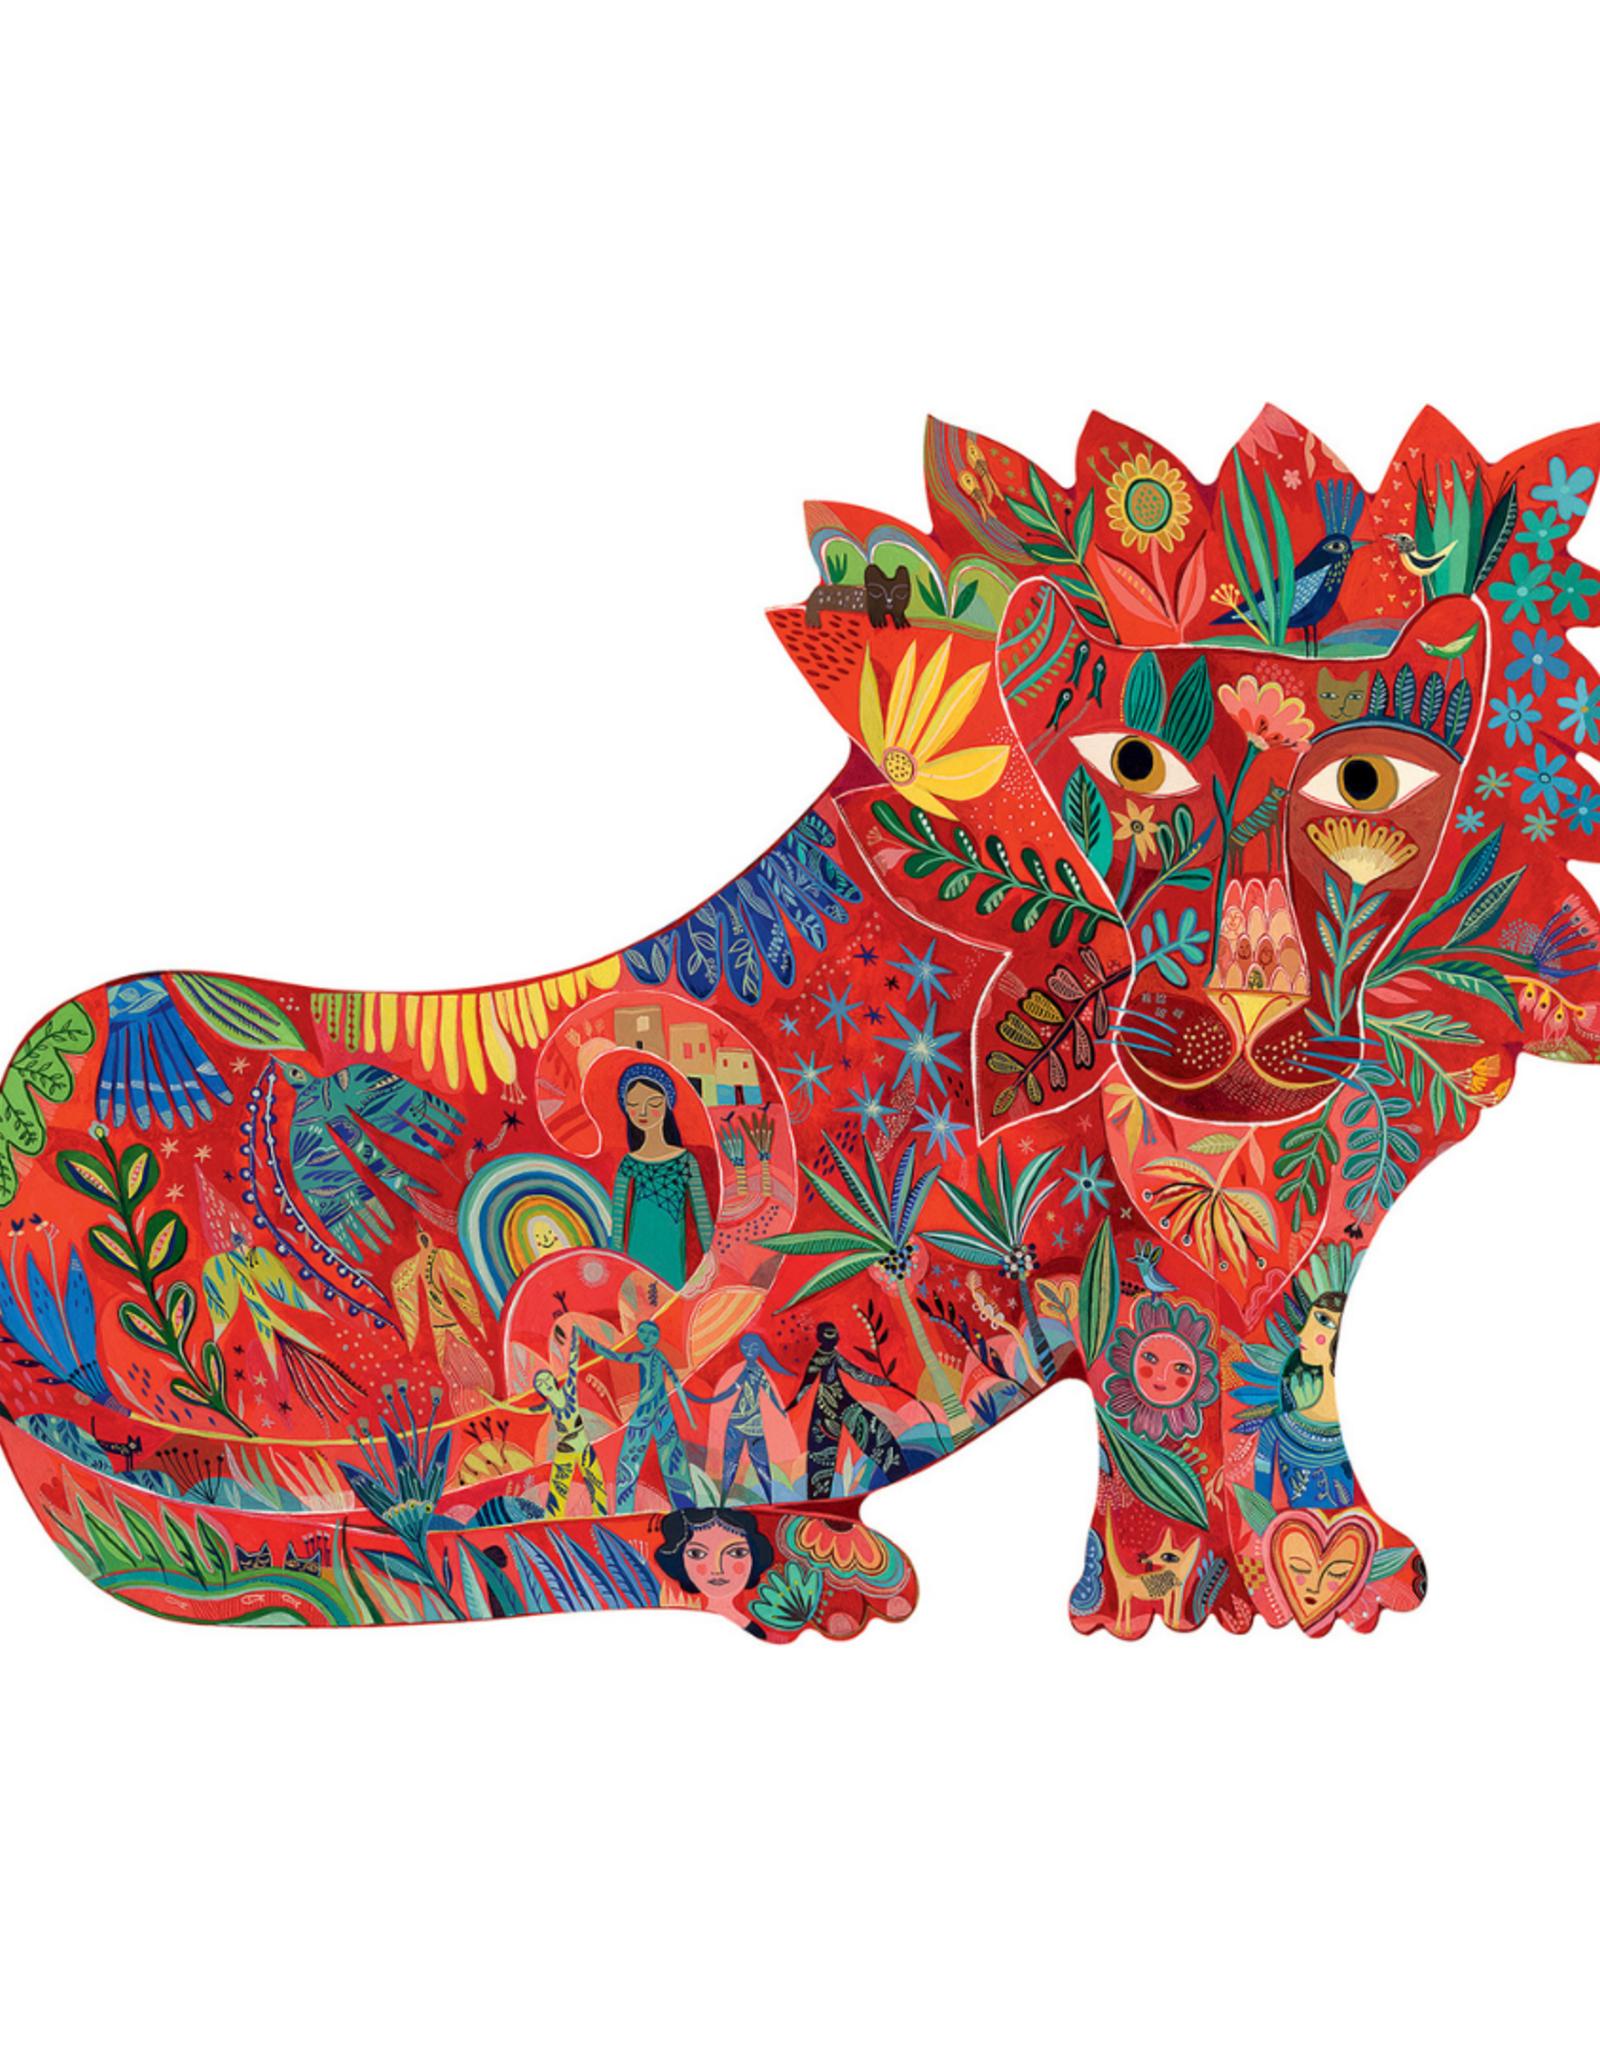 Djeco Puzz'art Lion - 150pcs